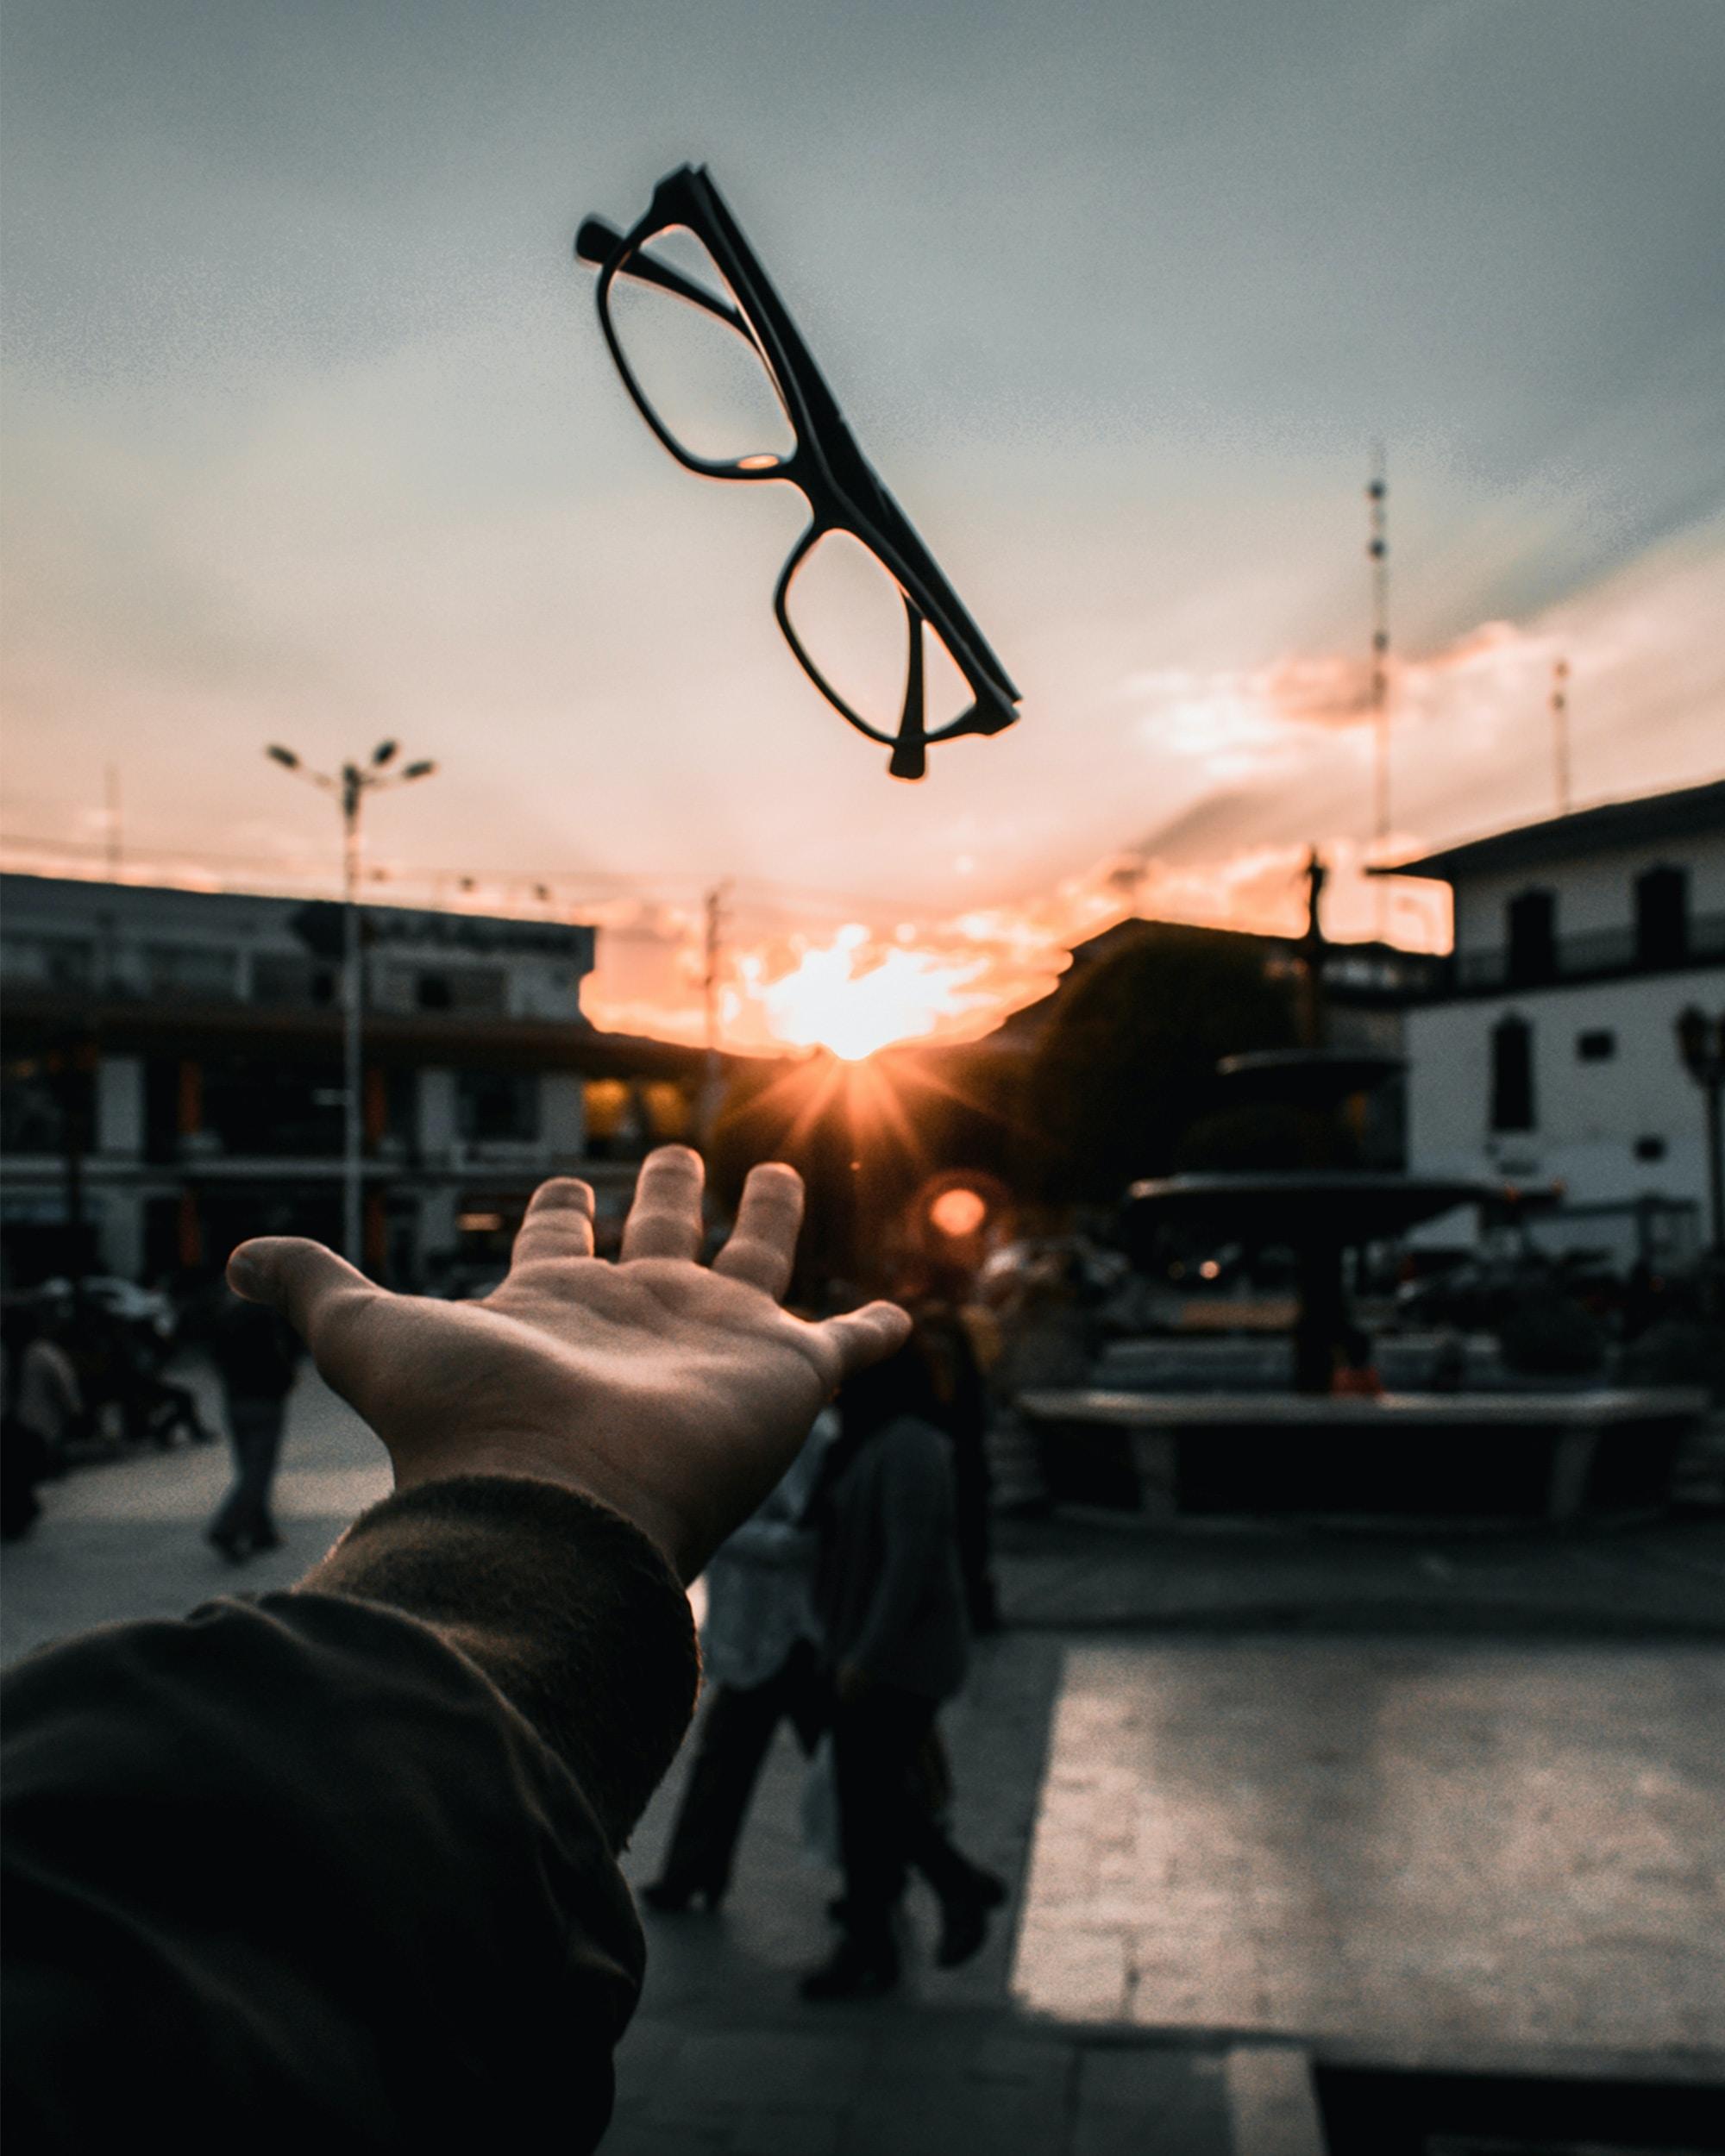 person catching black framed eyeglasses at golden hour